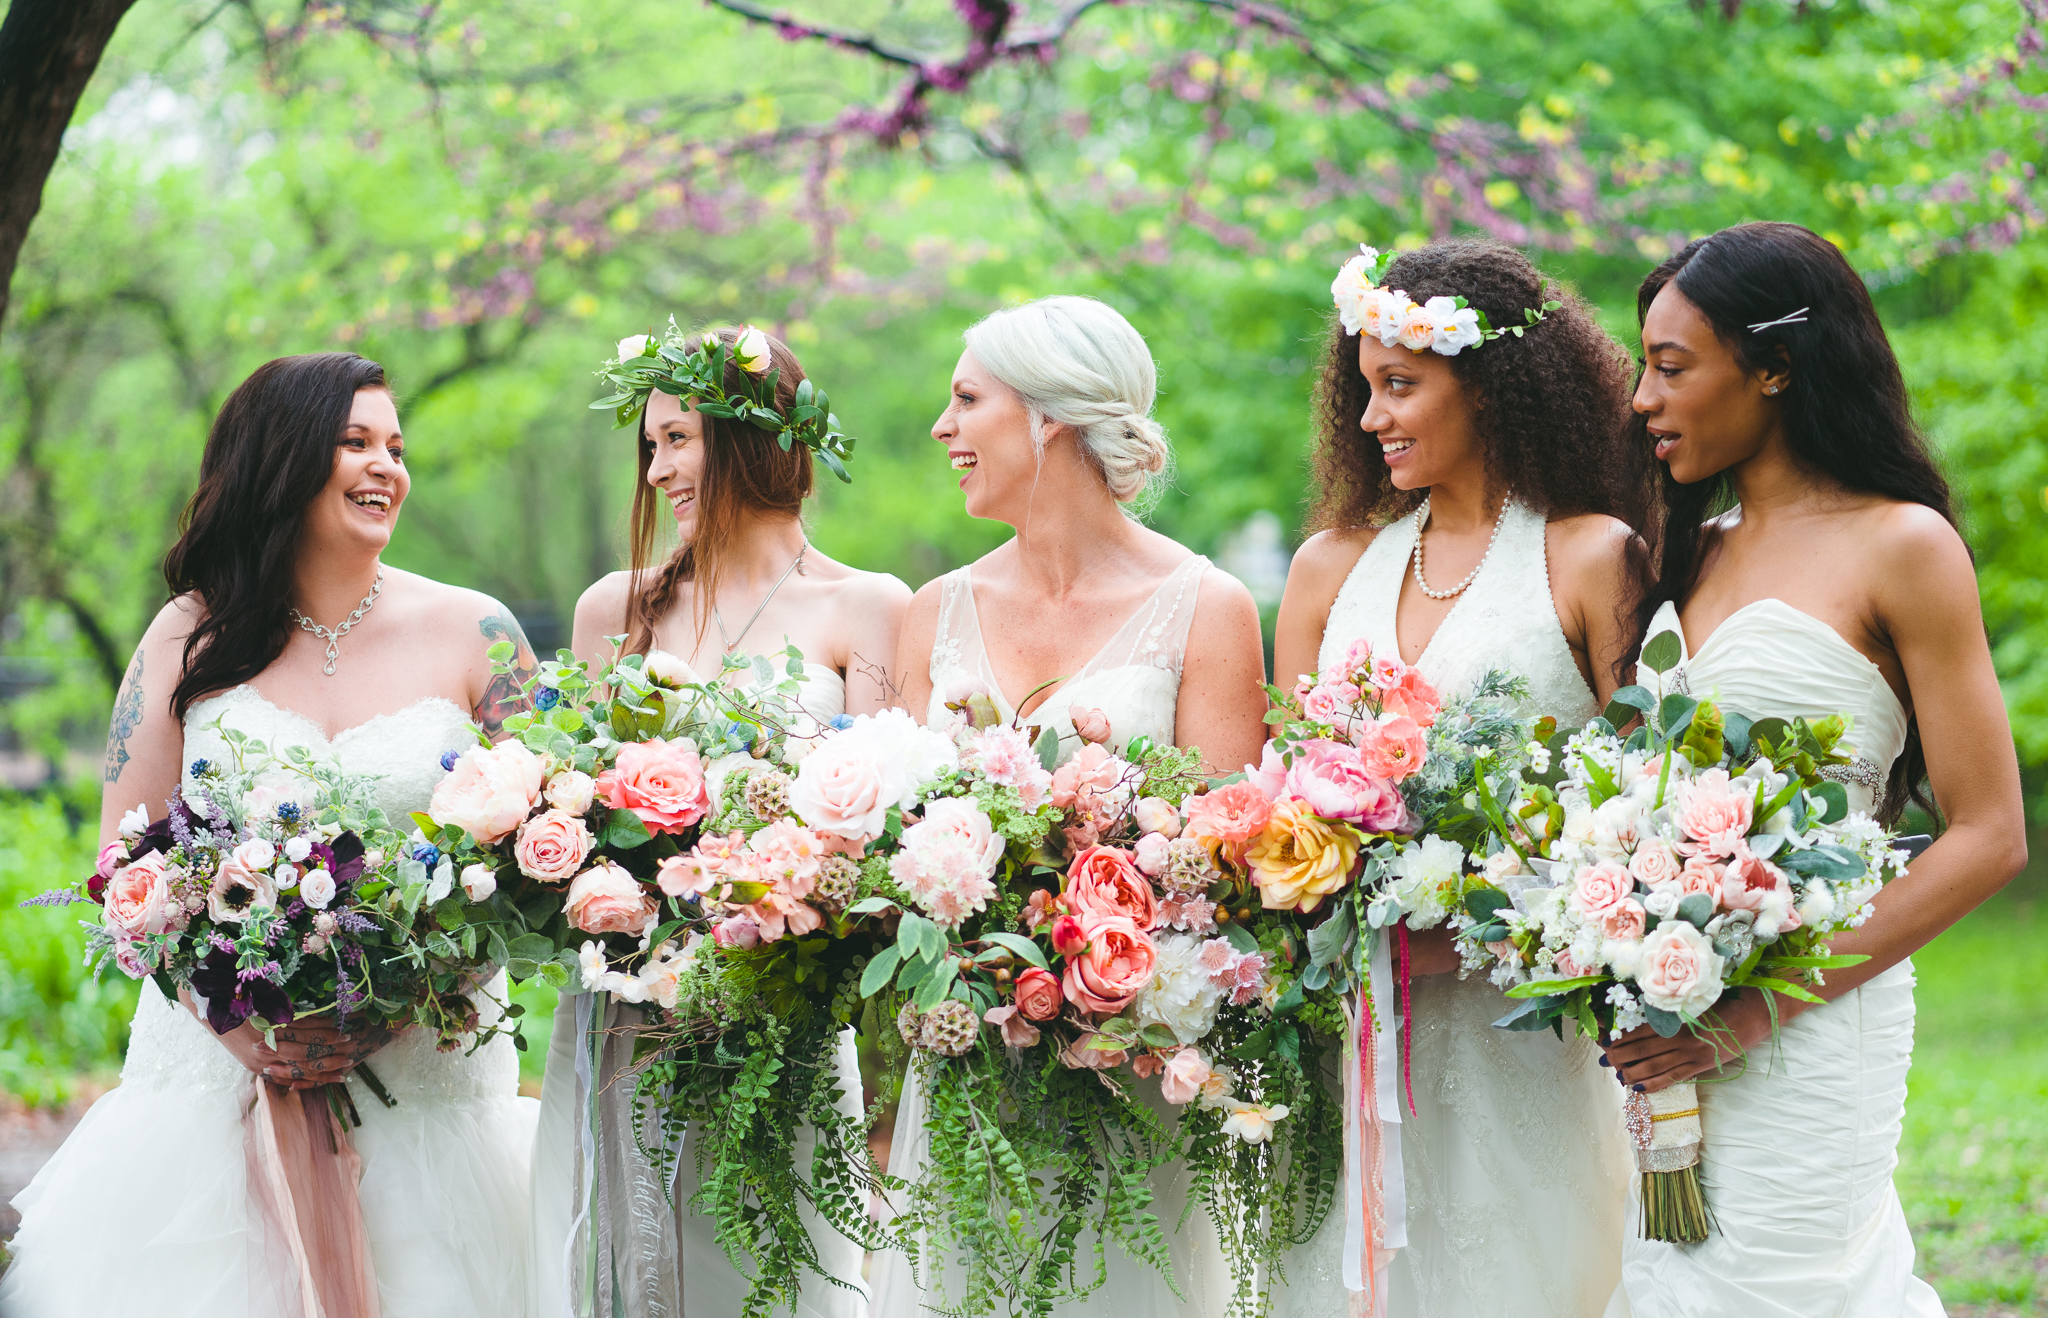 brides2-1-3.jpg